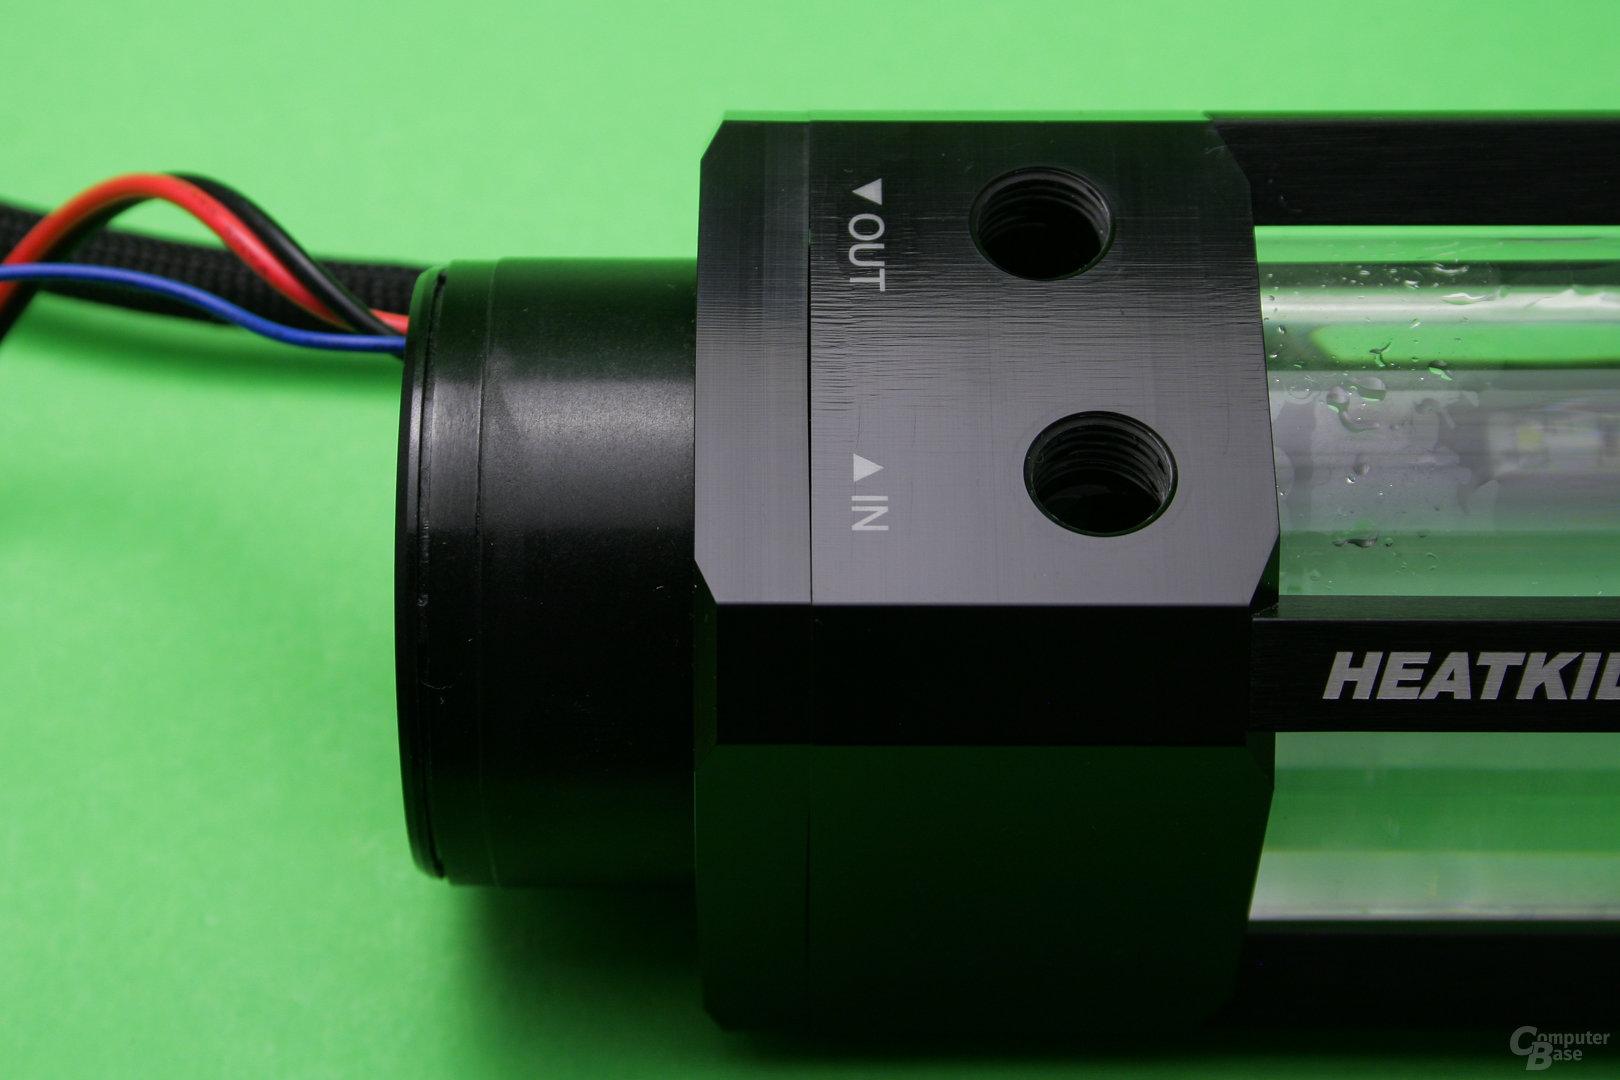 VPP655 mit Heatkiller Tube: Die Pumpe passt perfekt